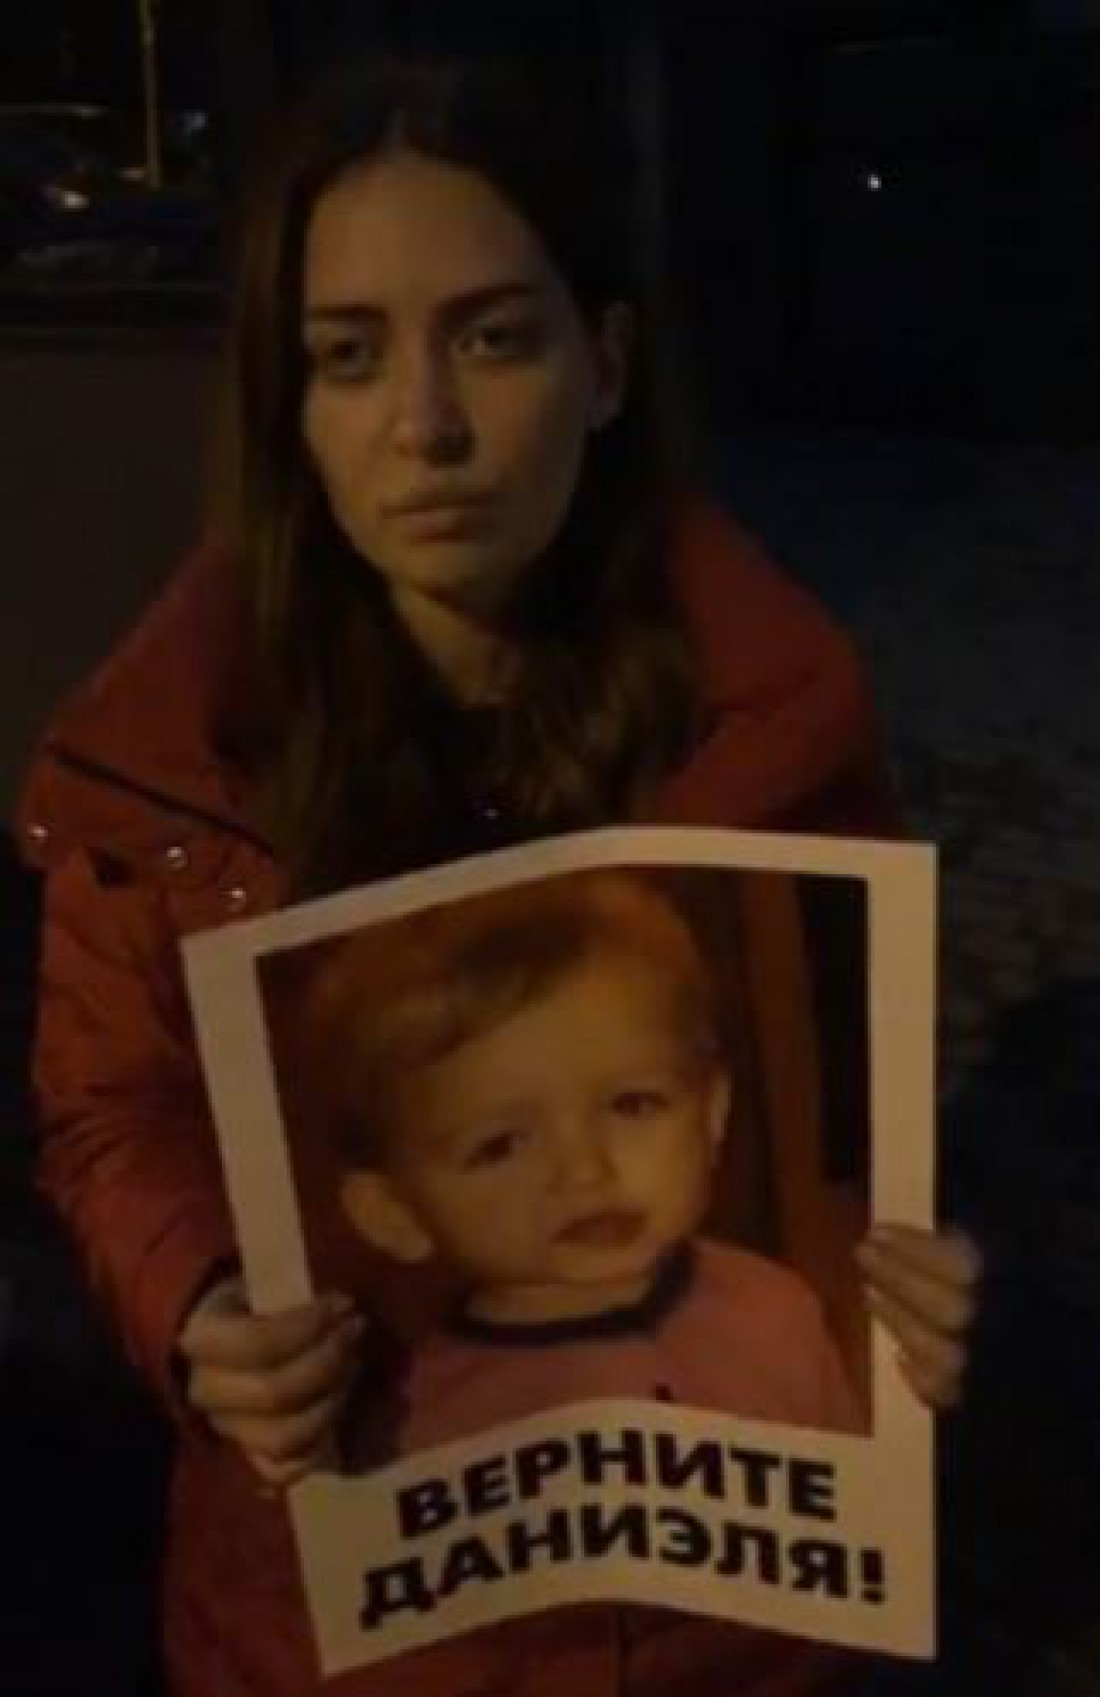 Иностранец забрал ребенка во время прогулки и вывез в Киев